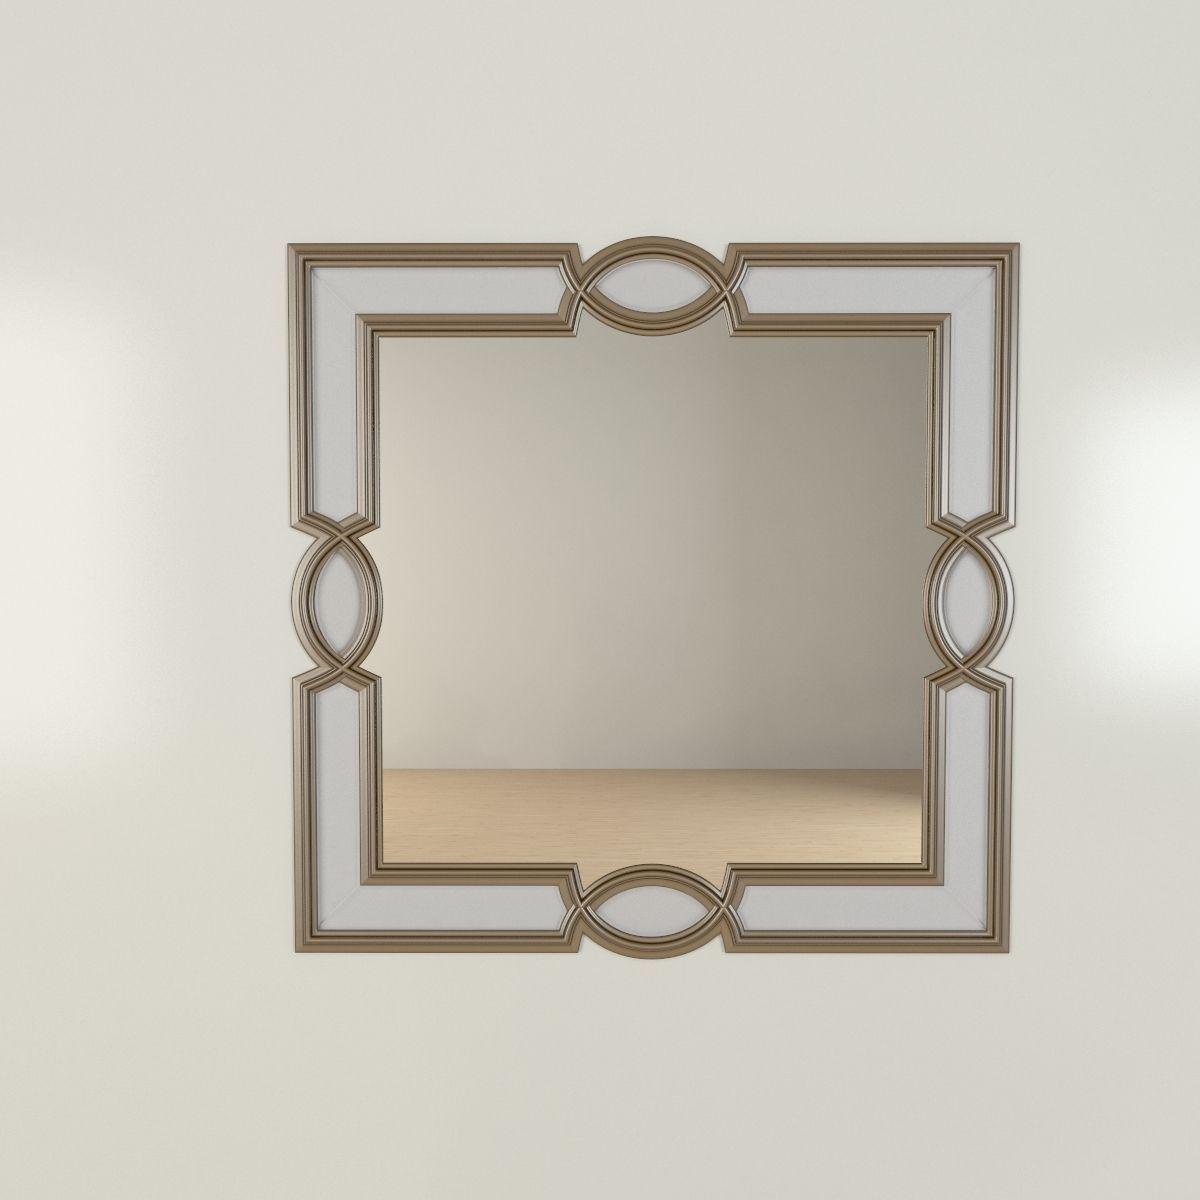 Ornamental brass mirror 3d model max obj 3ds fbx for Mirror 3d model